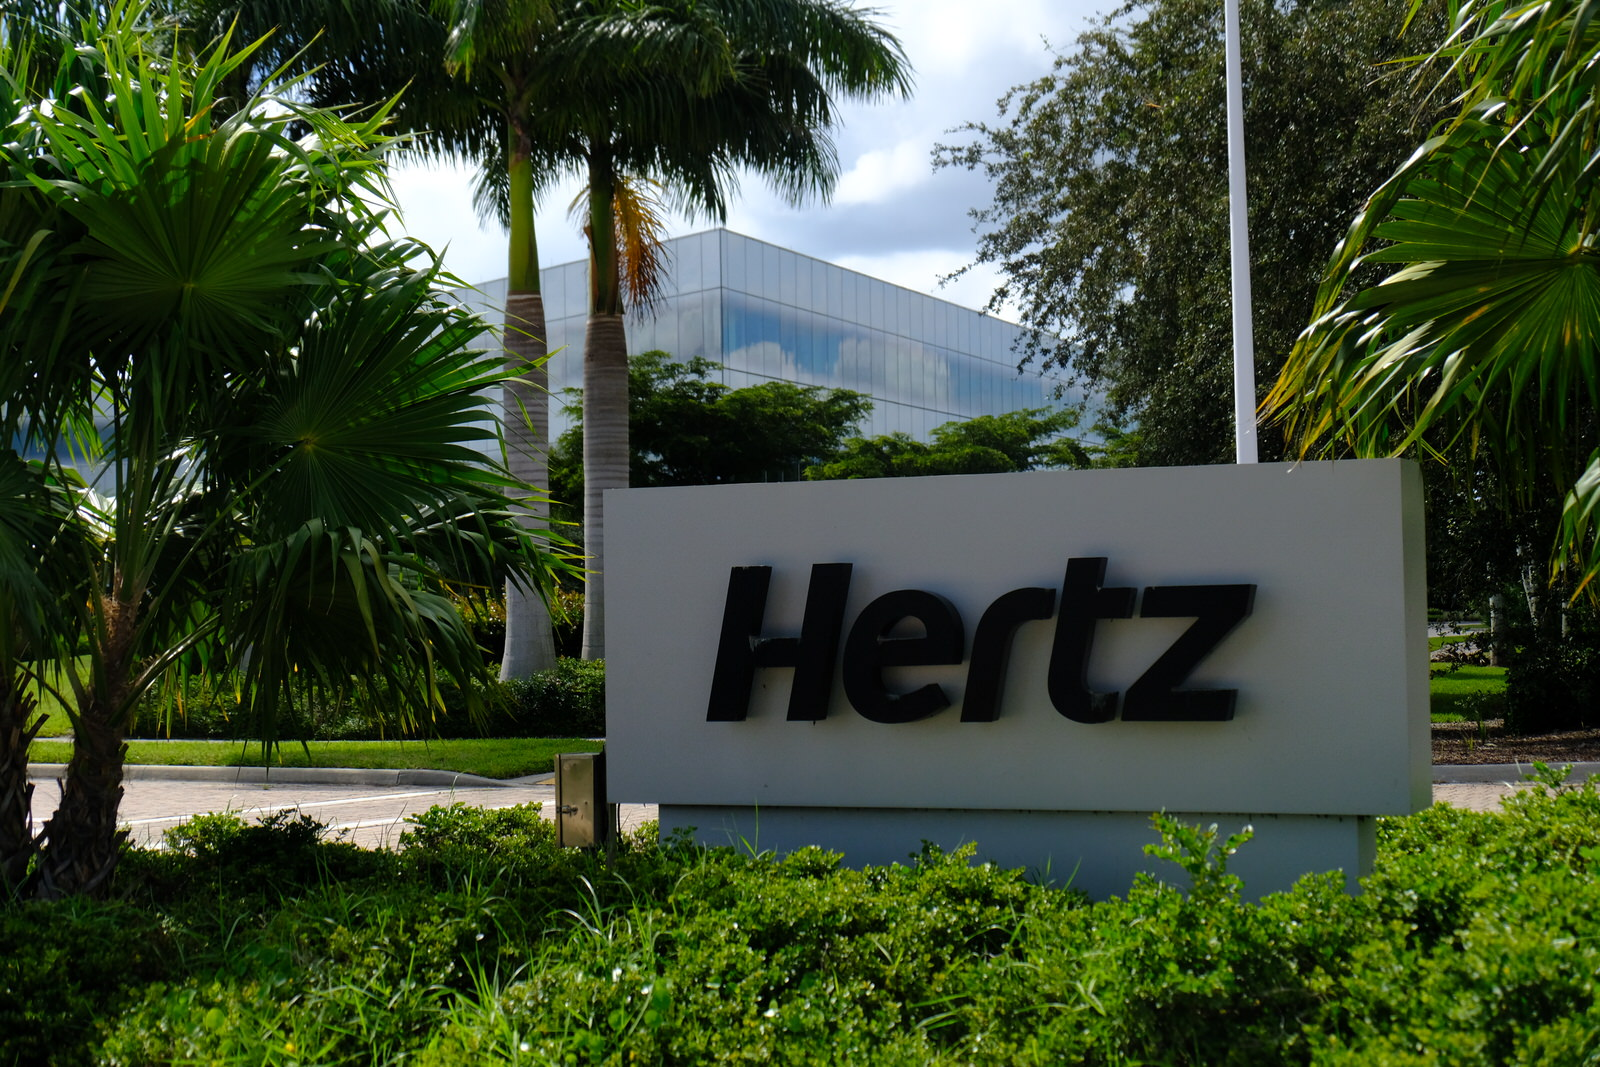 Entrance to Hertz's corporate headquarters in Estero, Florida.